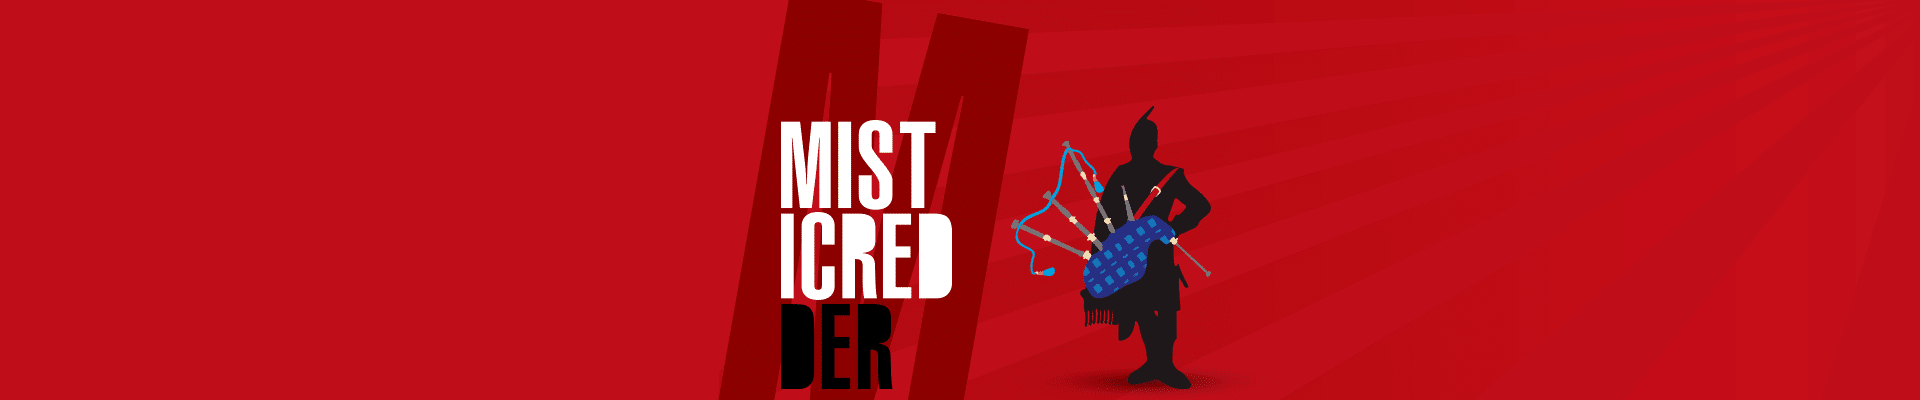 Misticredder_copertina